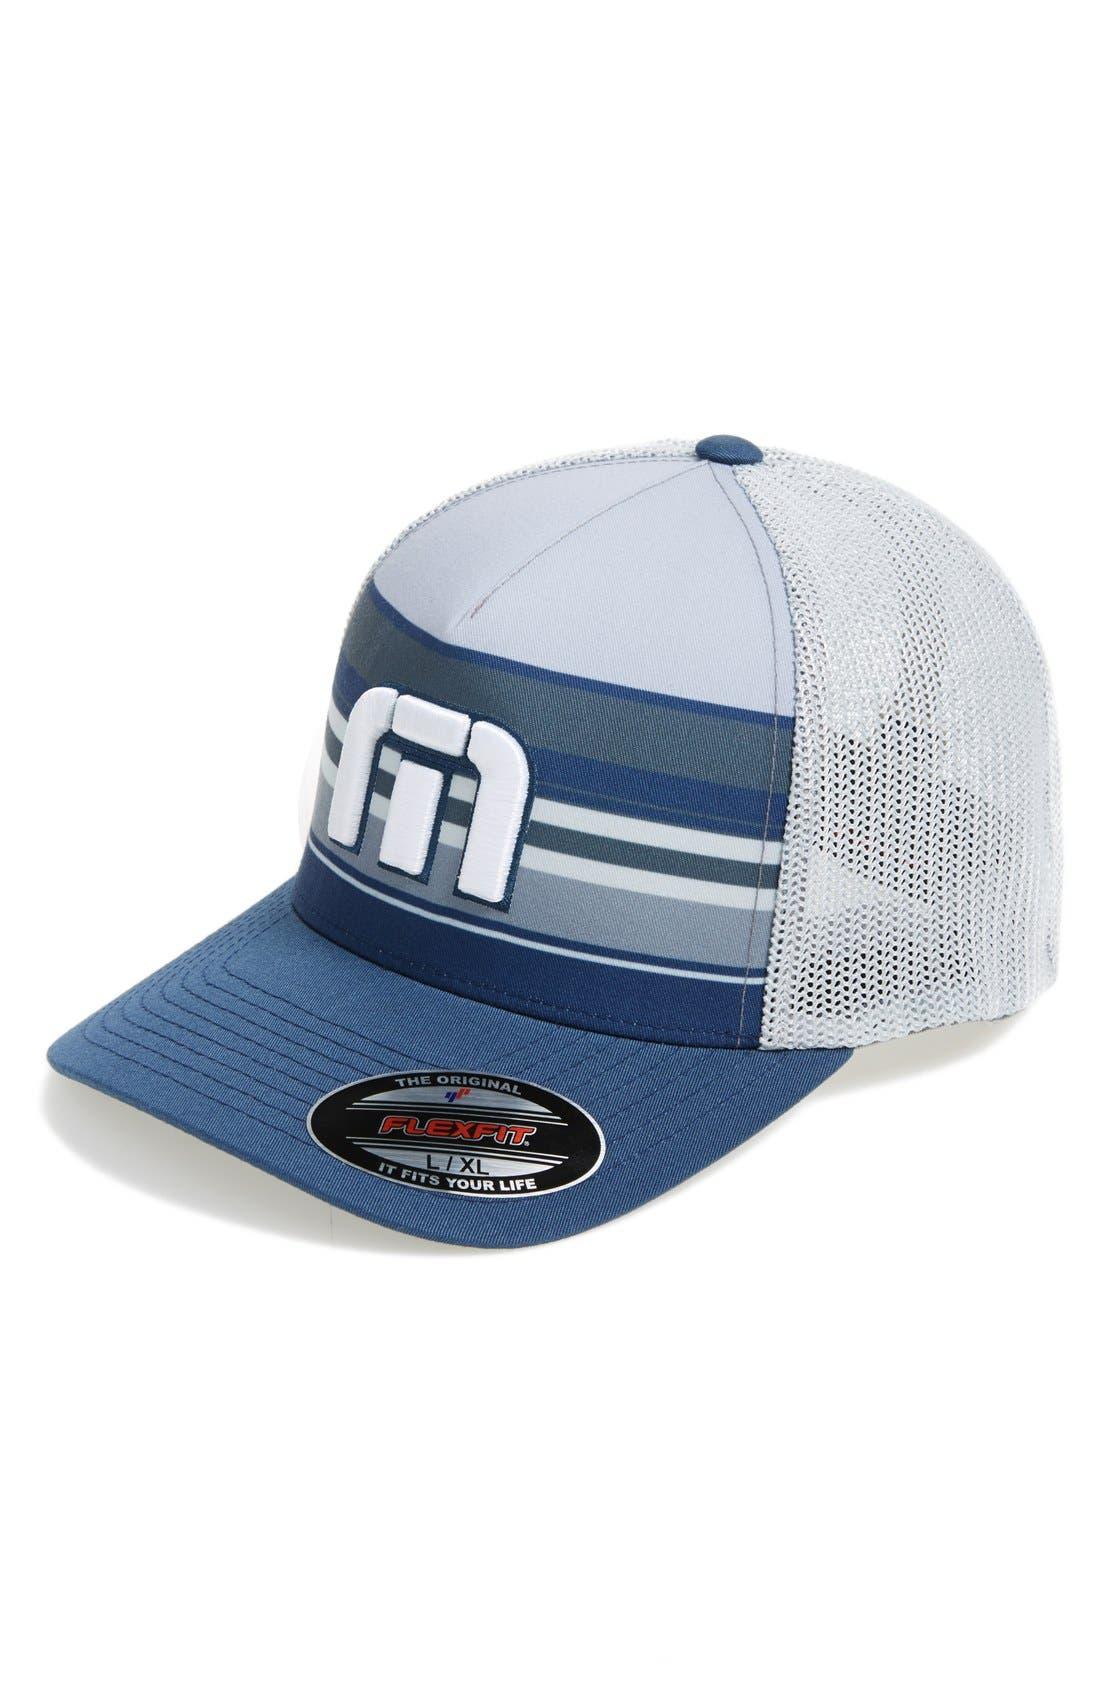 Alternate Image 1 Selected - Travis Mathew 'Cylinder' Trucker Hat